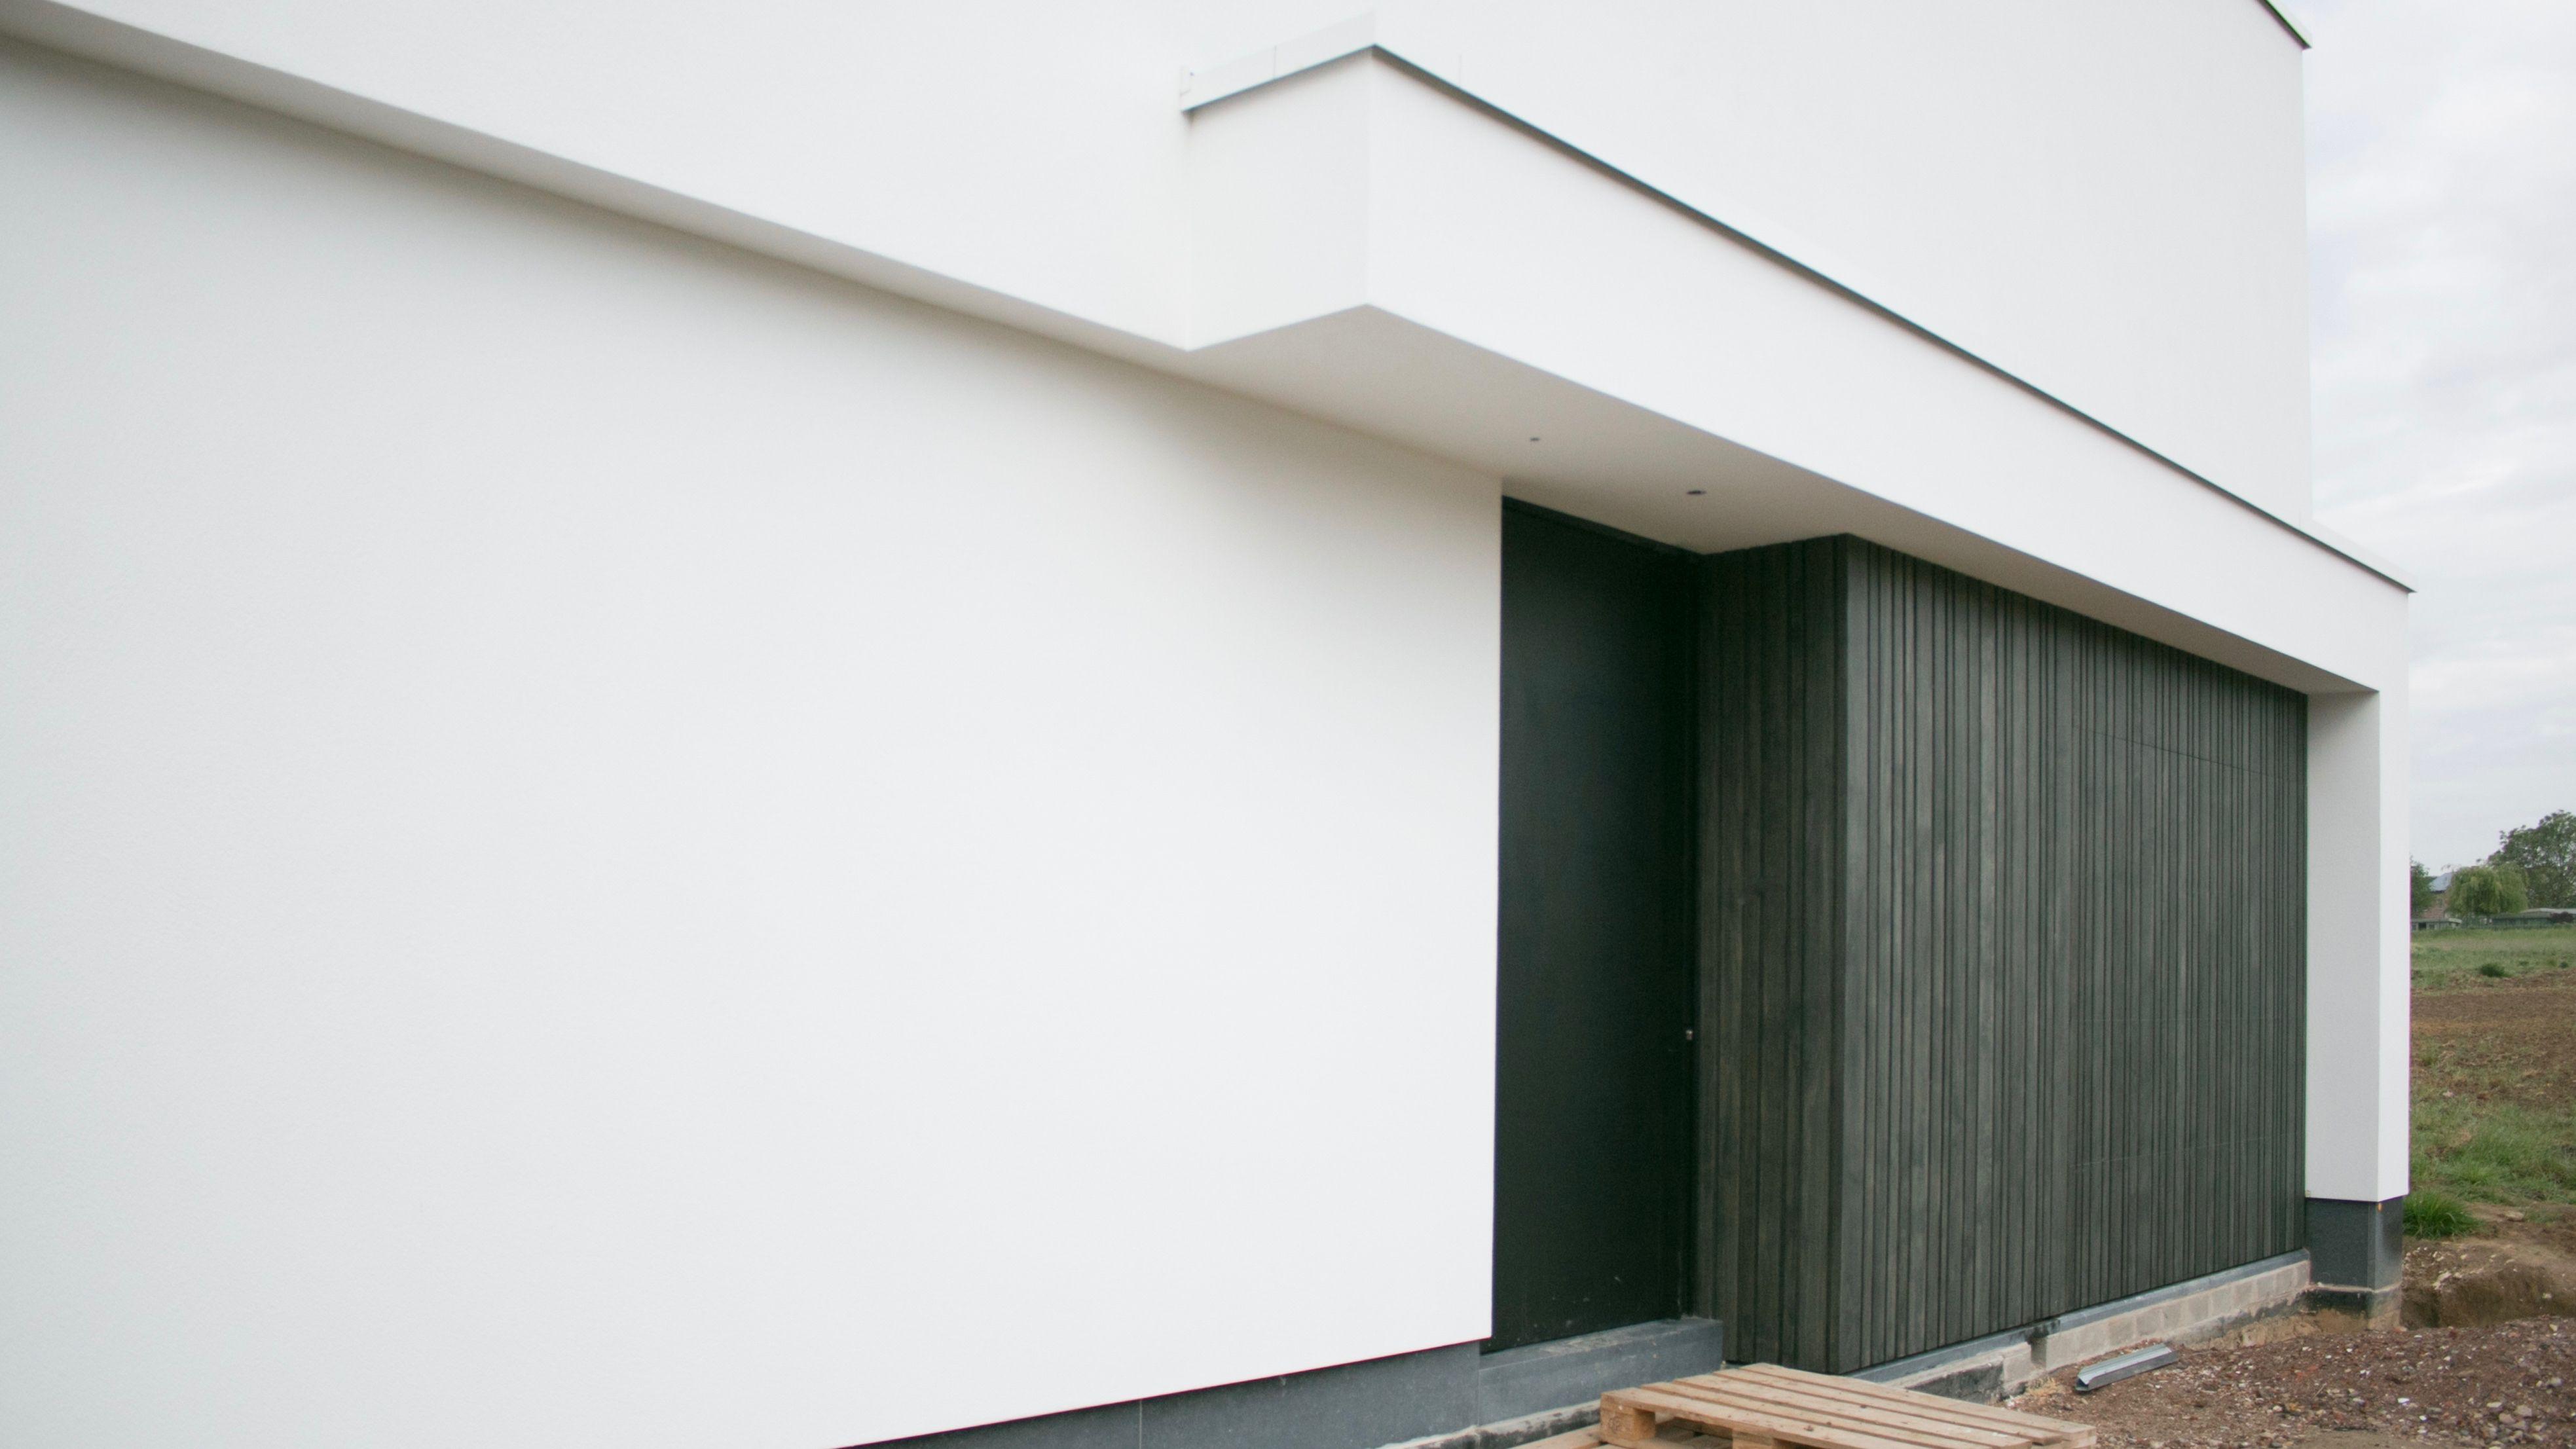 Niko wauters ben woning energiezuinige moderne minimalistische